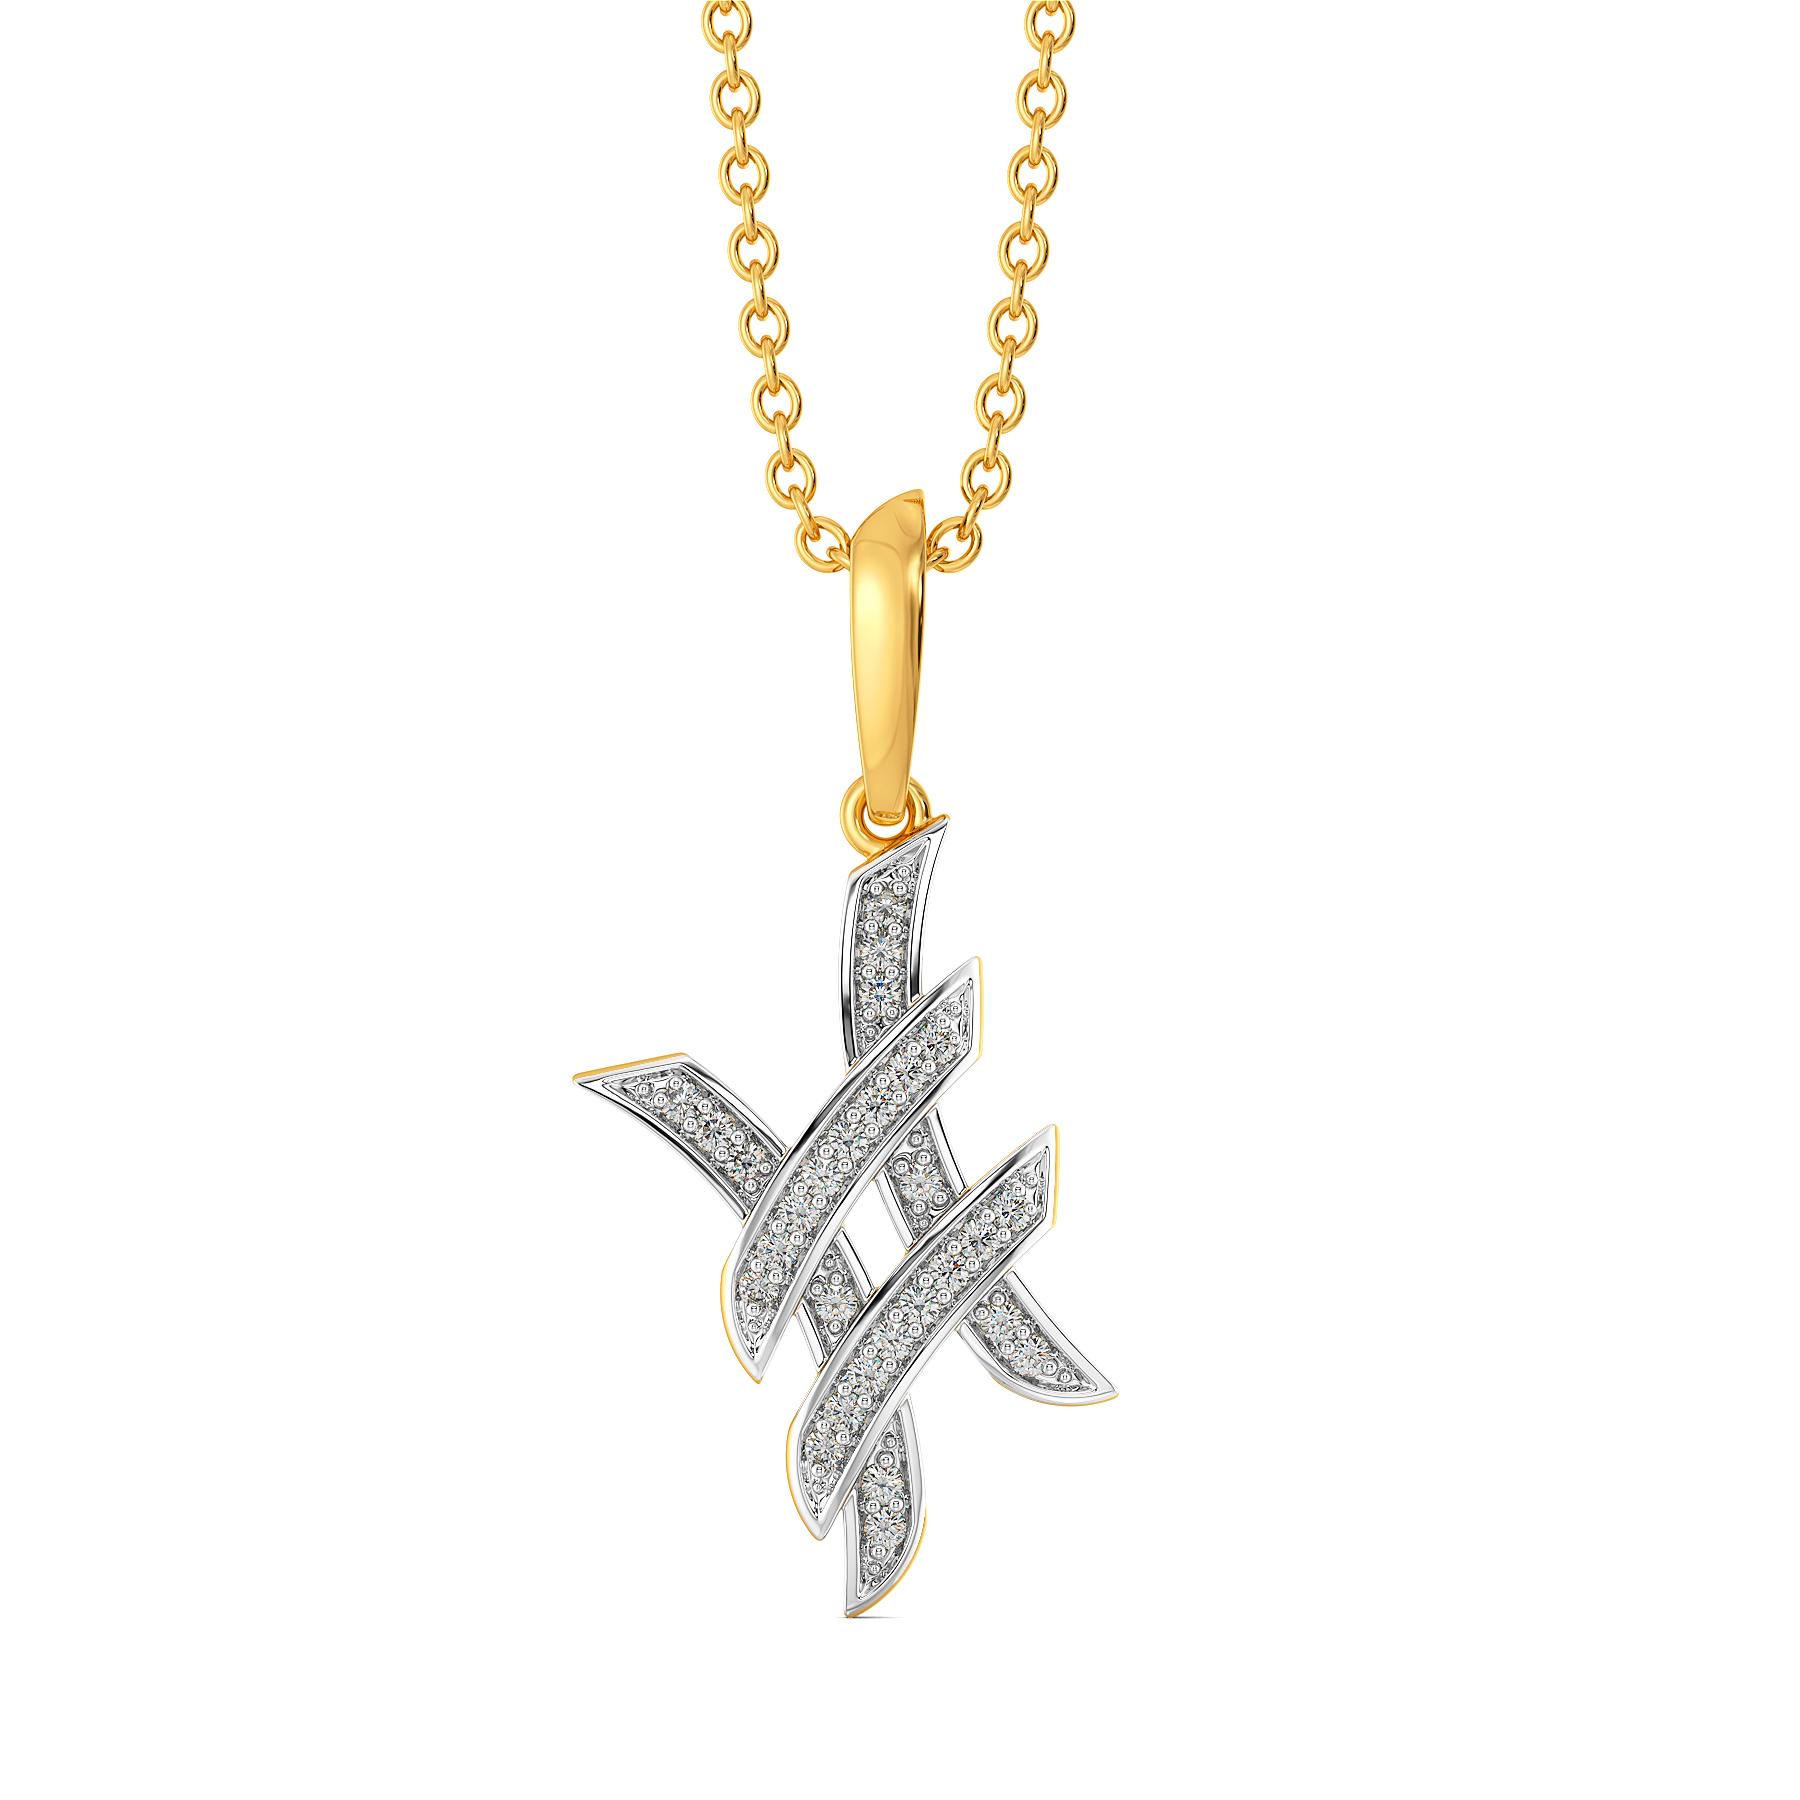 Reinvented Diamond Pendants